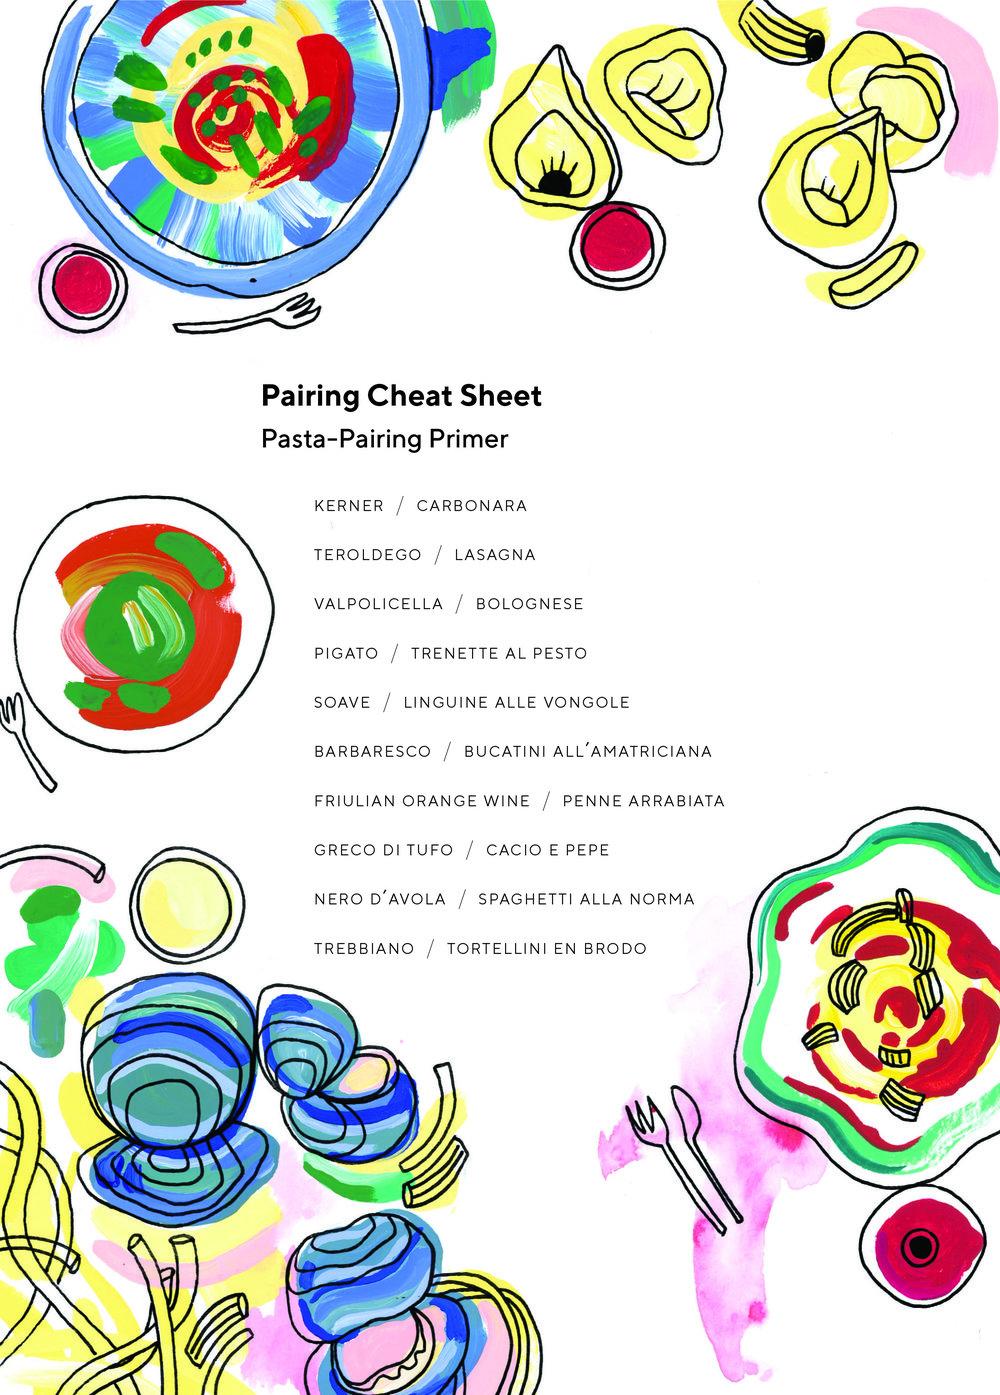 pasta pairing image.jpg